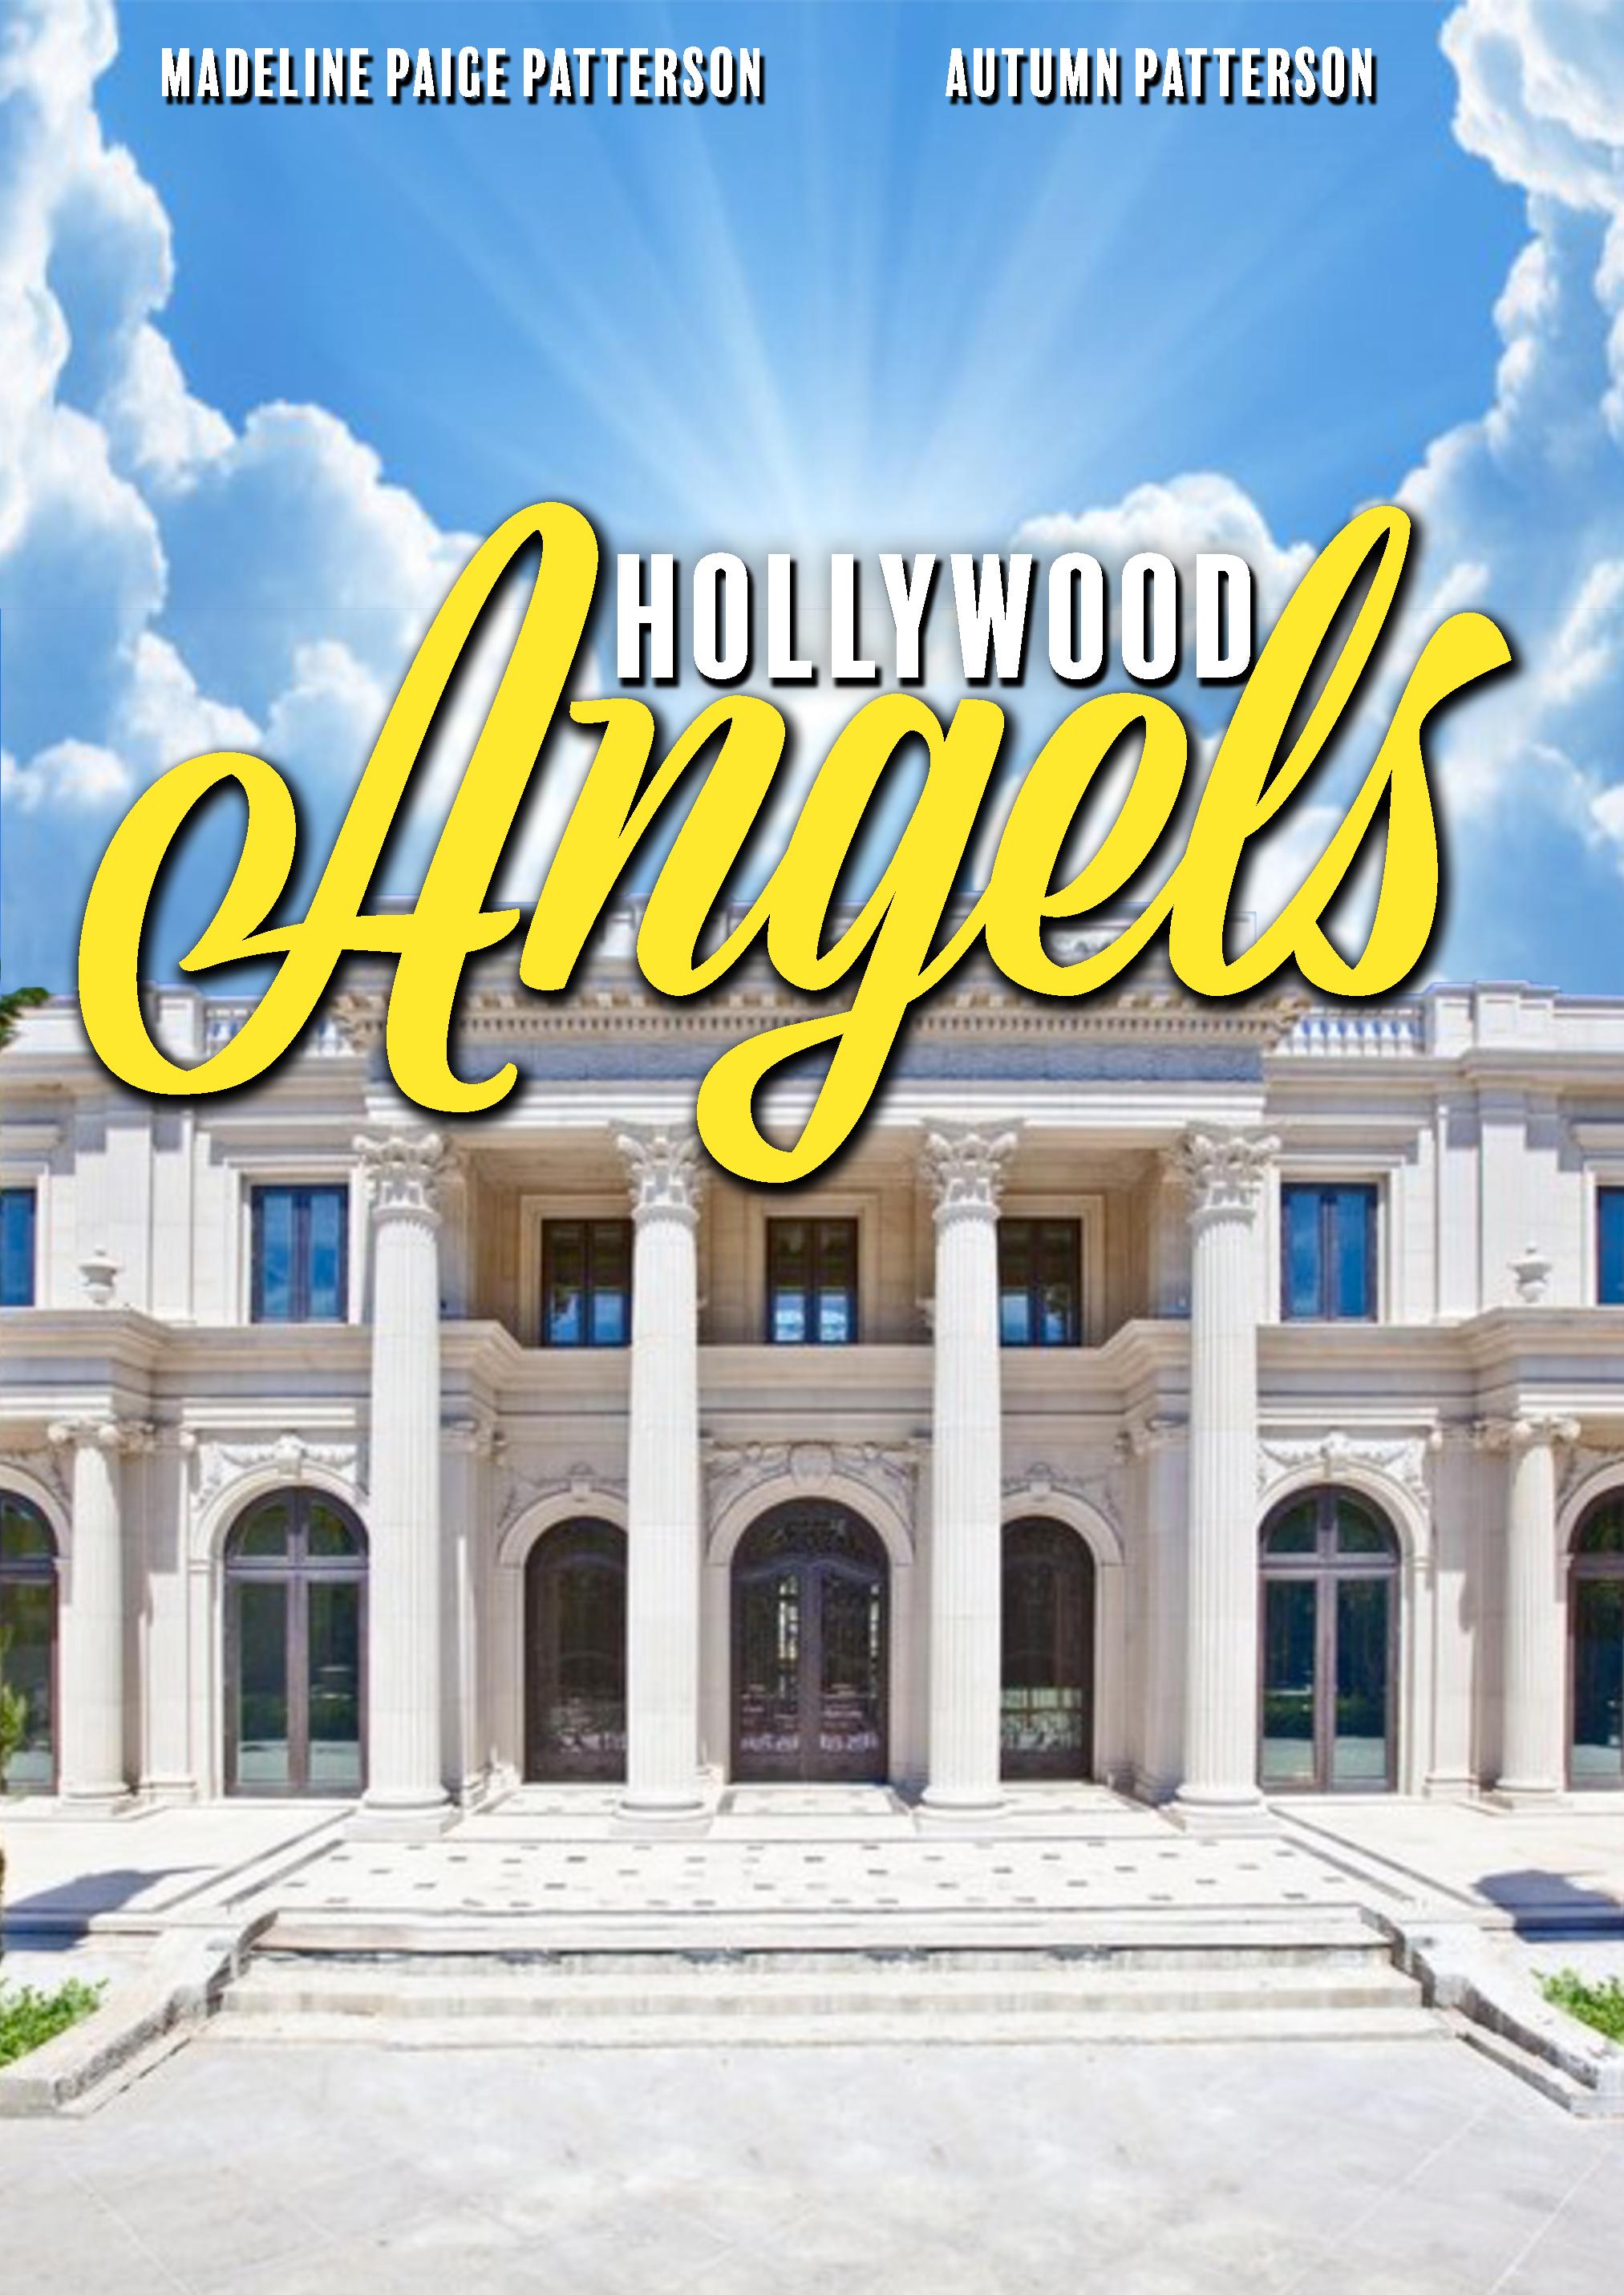 hollywoodangels-tempposterv2.jpg